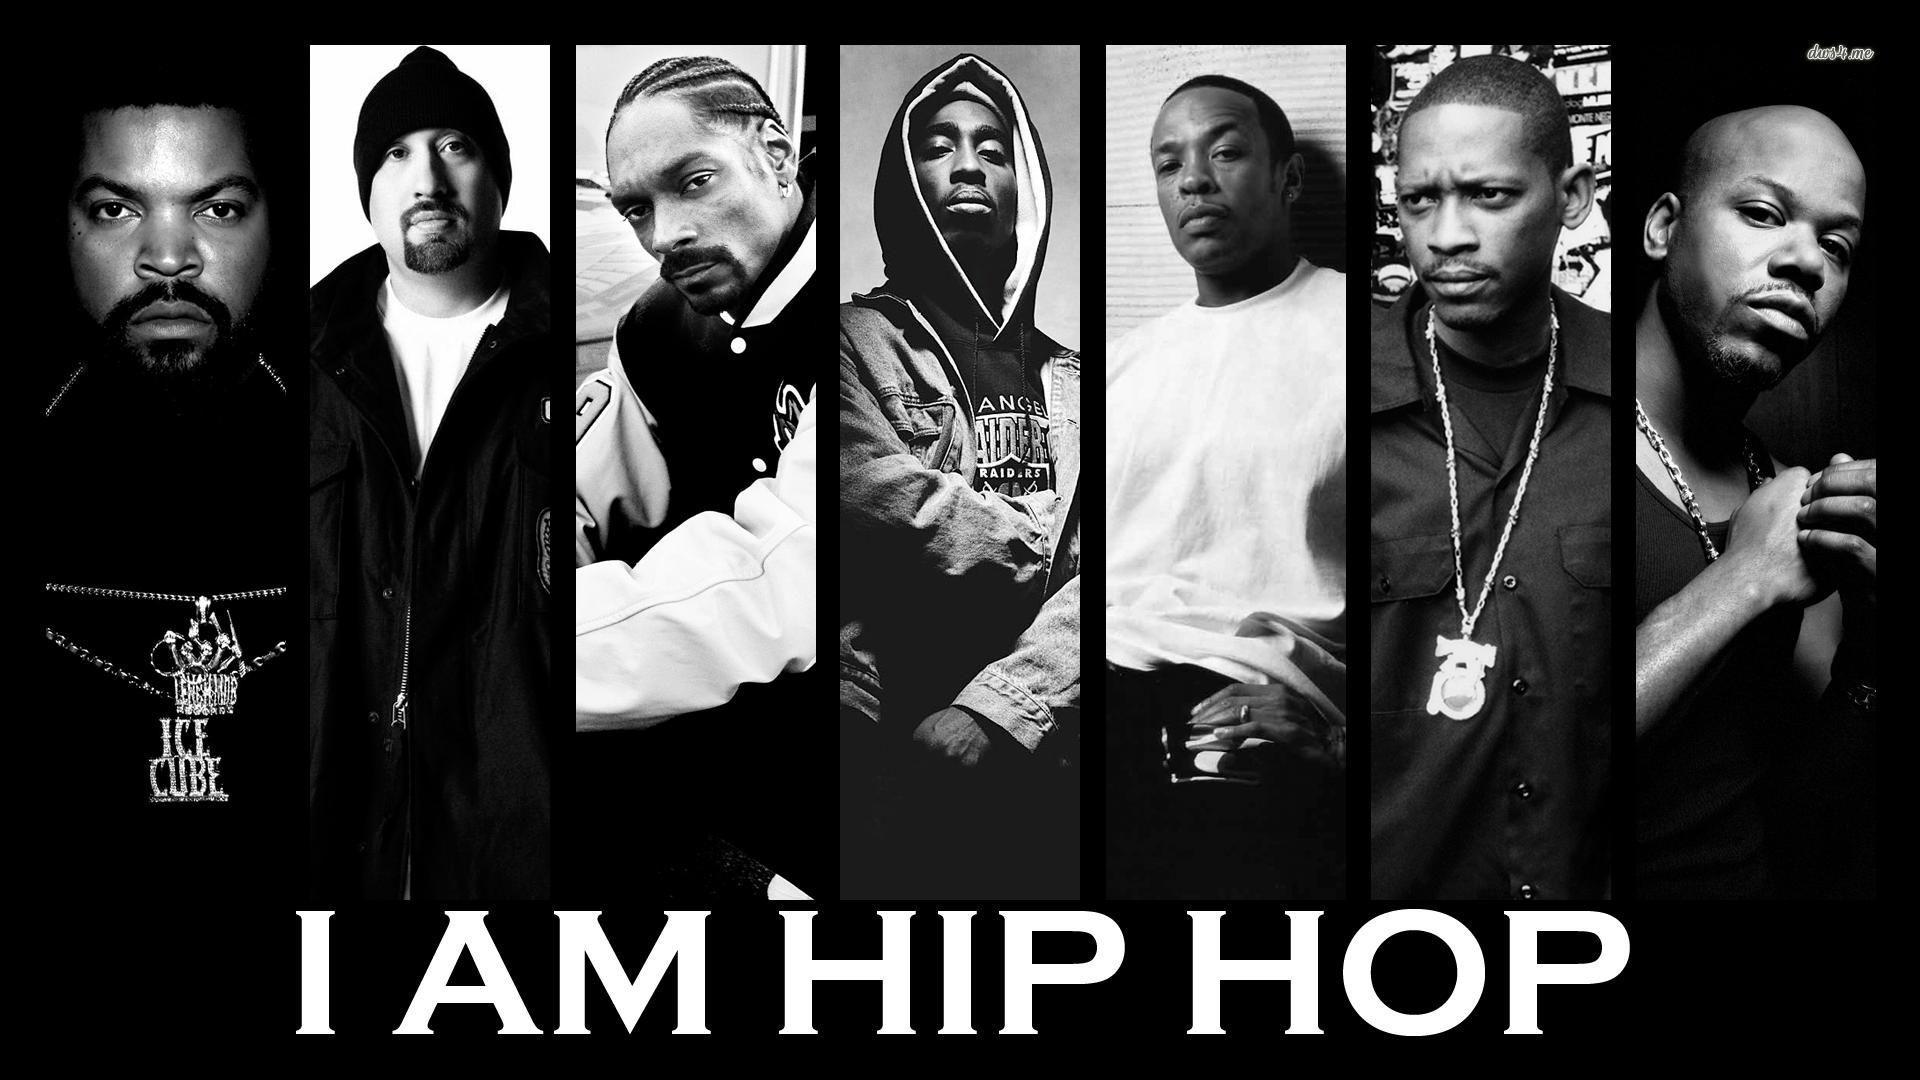 Tupac Shakur West Coast Wallpapers - Top Free Tupac Shakur West